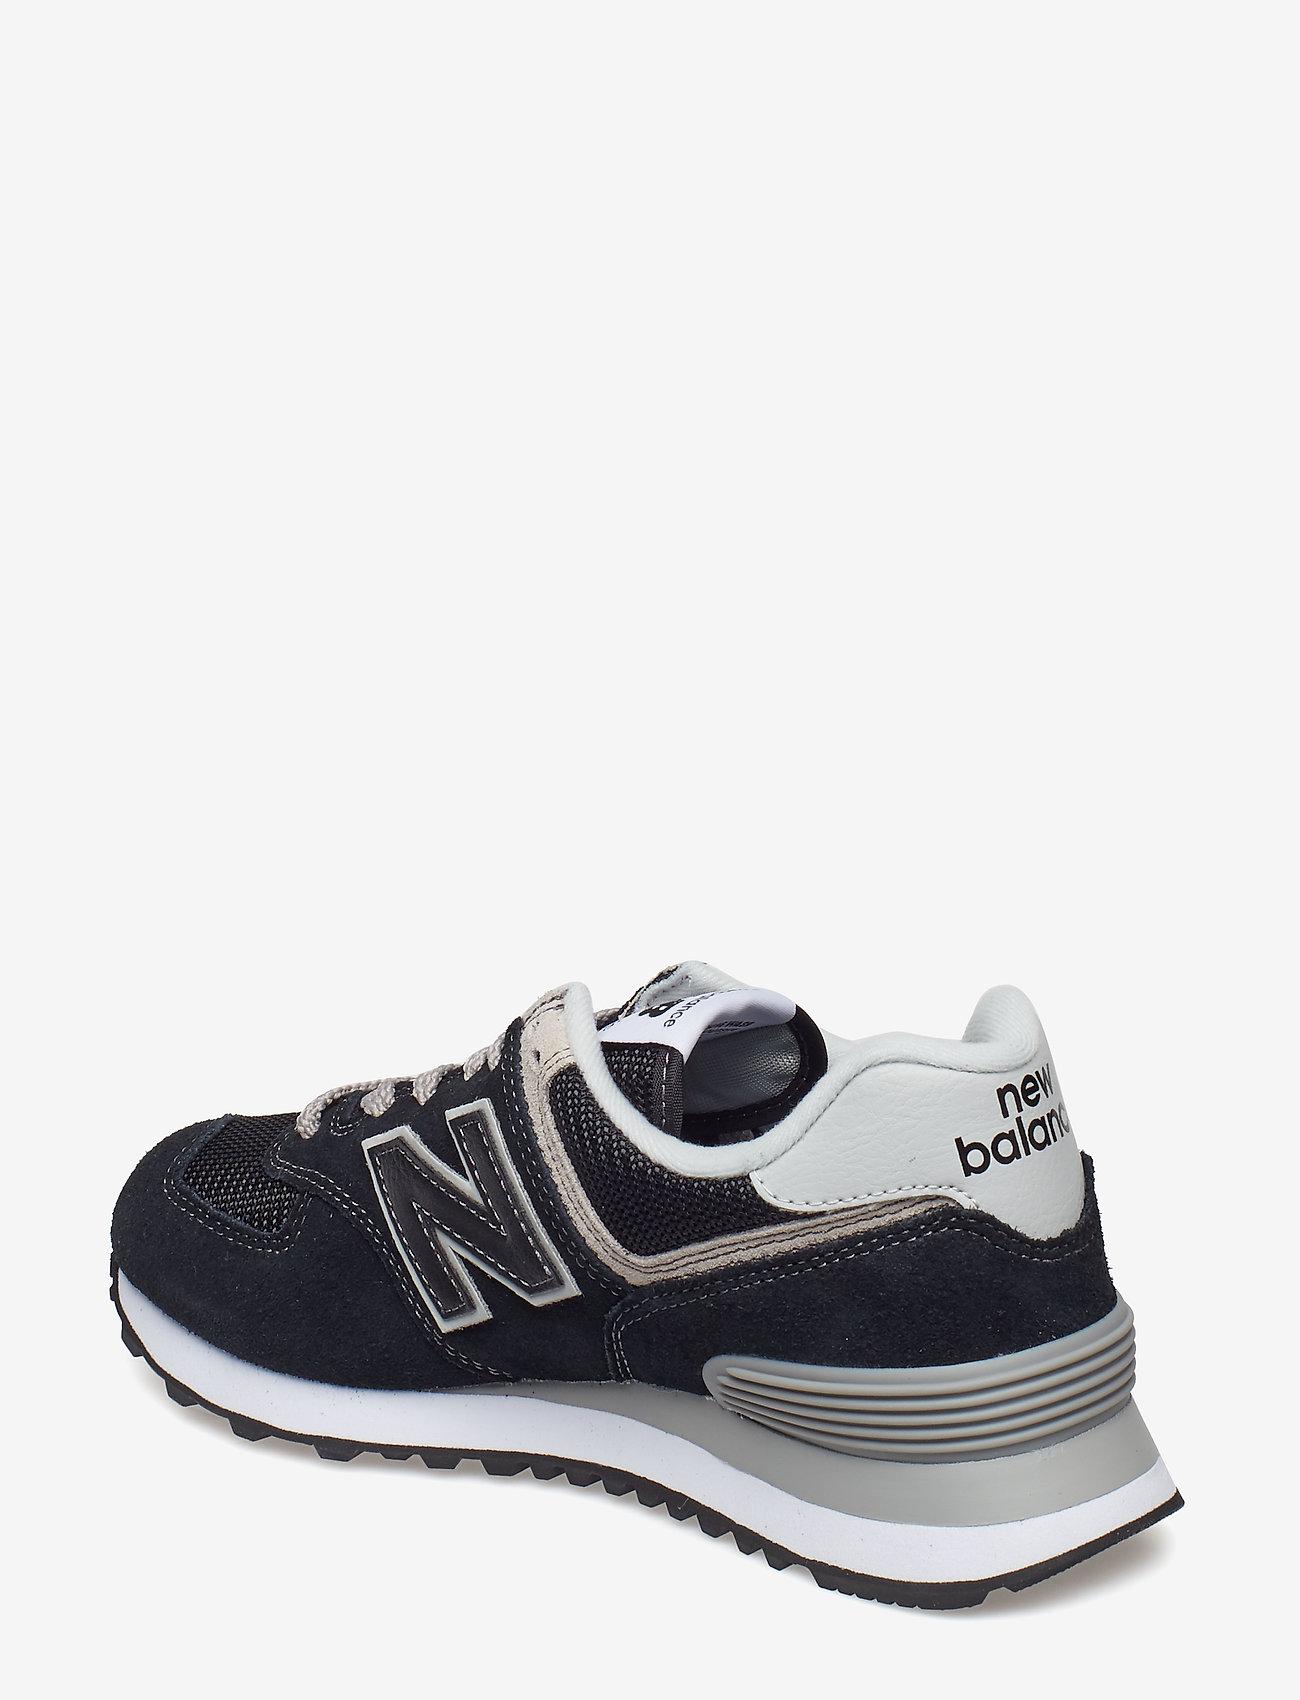 New Balance - WL574EB - låga sneakers - black - 2